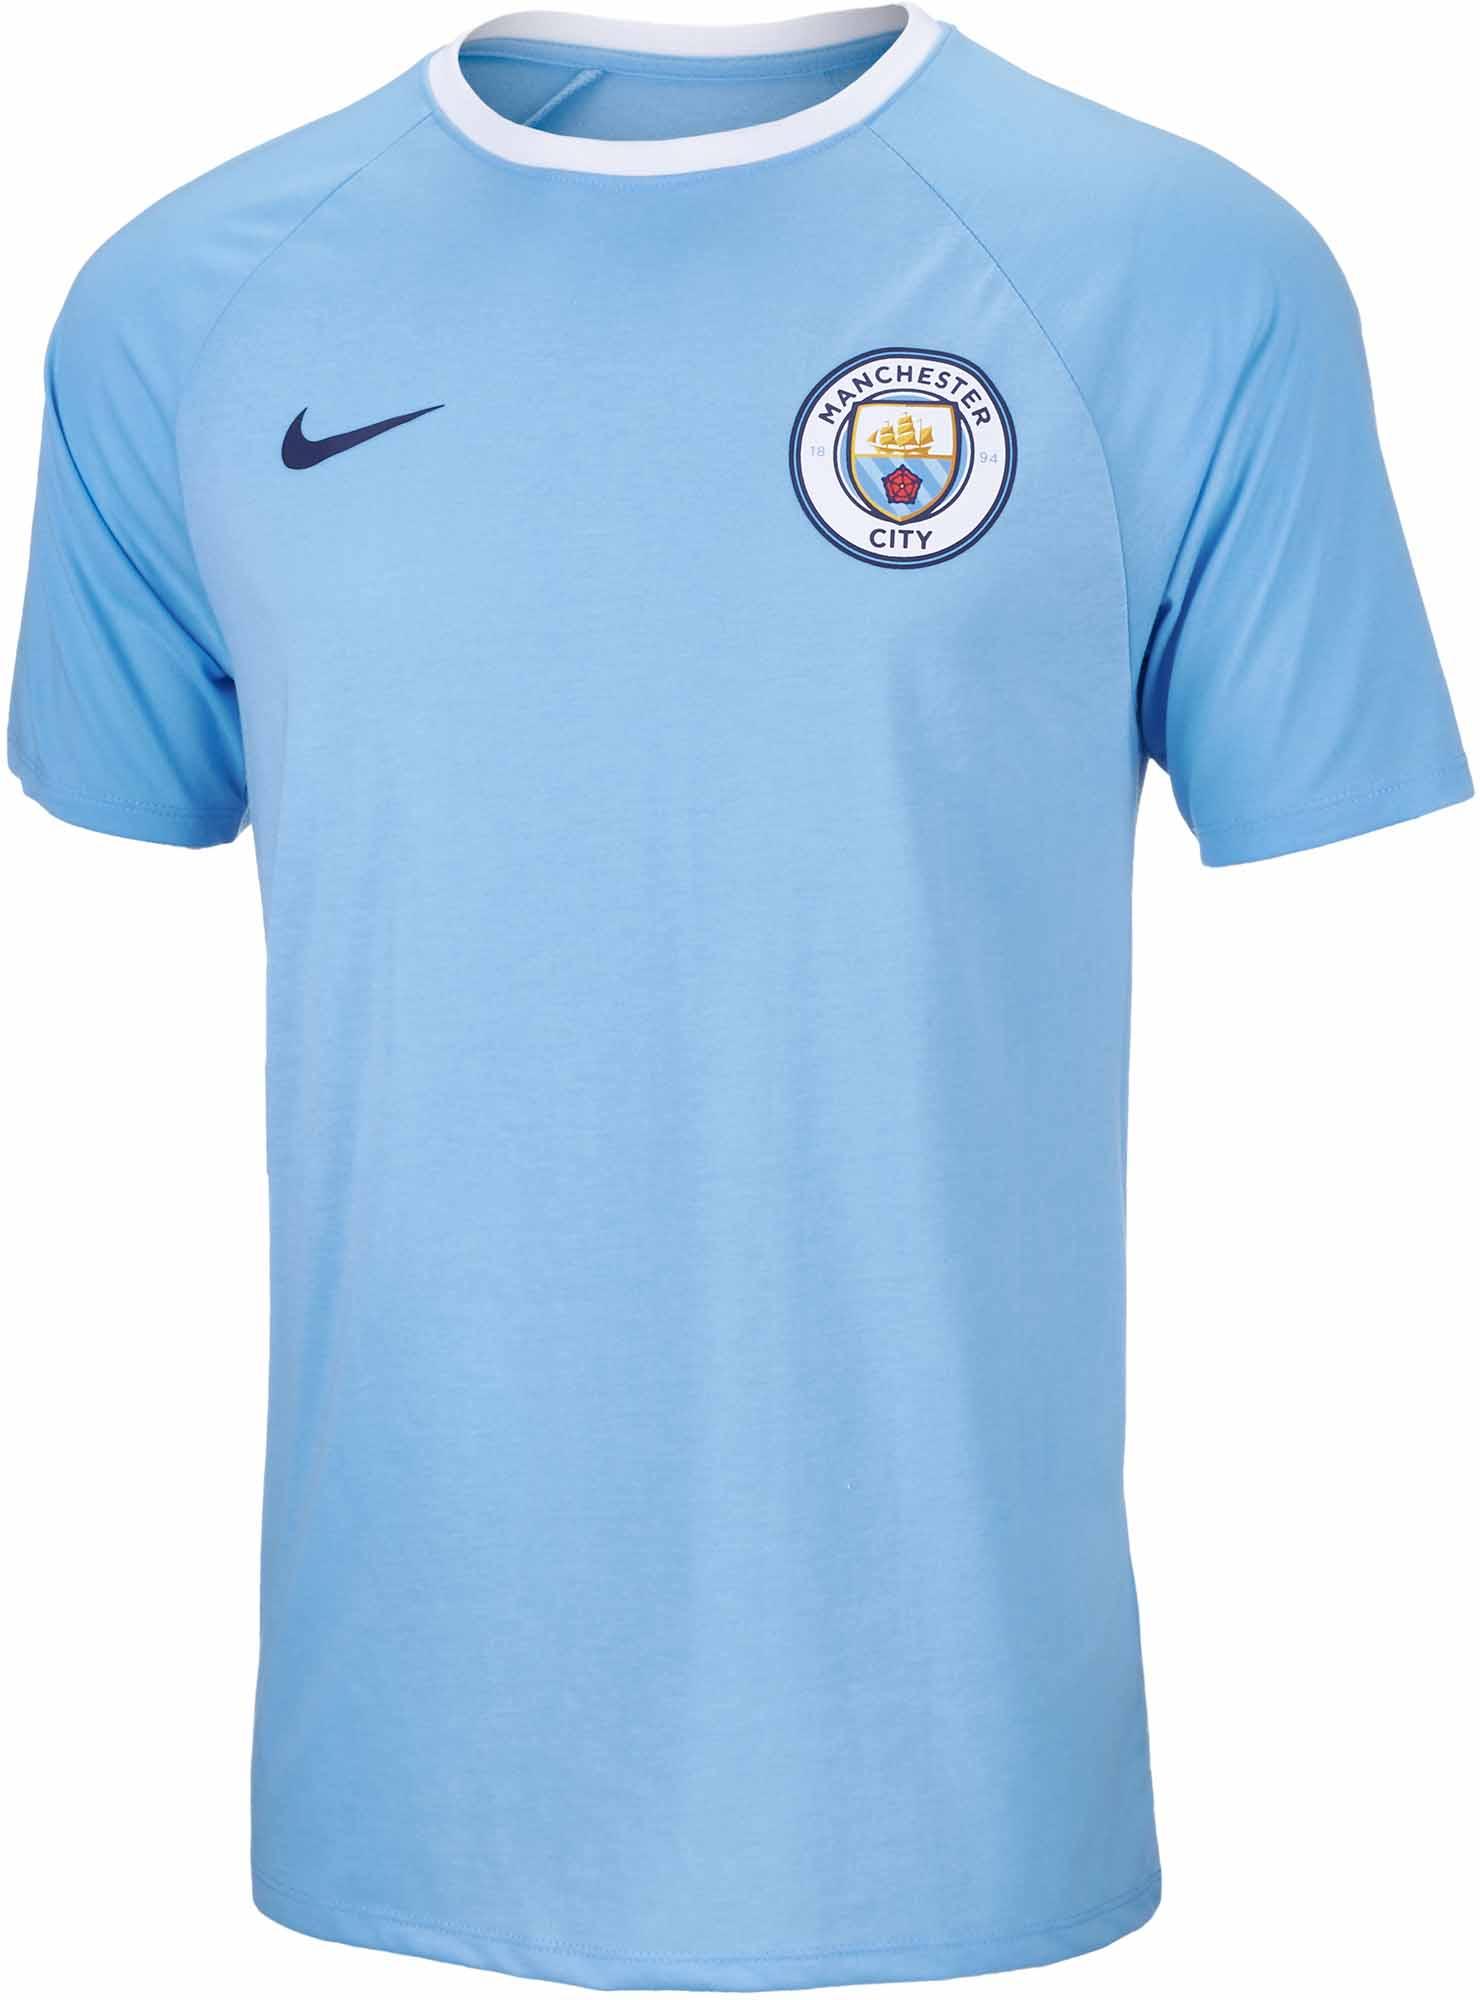 online store 477e7 5eba6 Nike Manchester City Match Tee – Field Blue   White